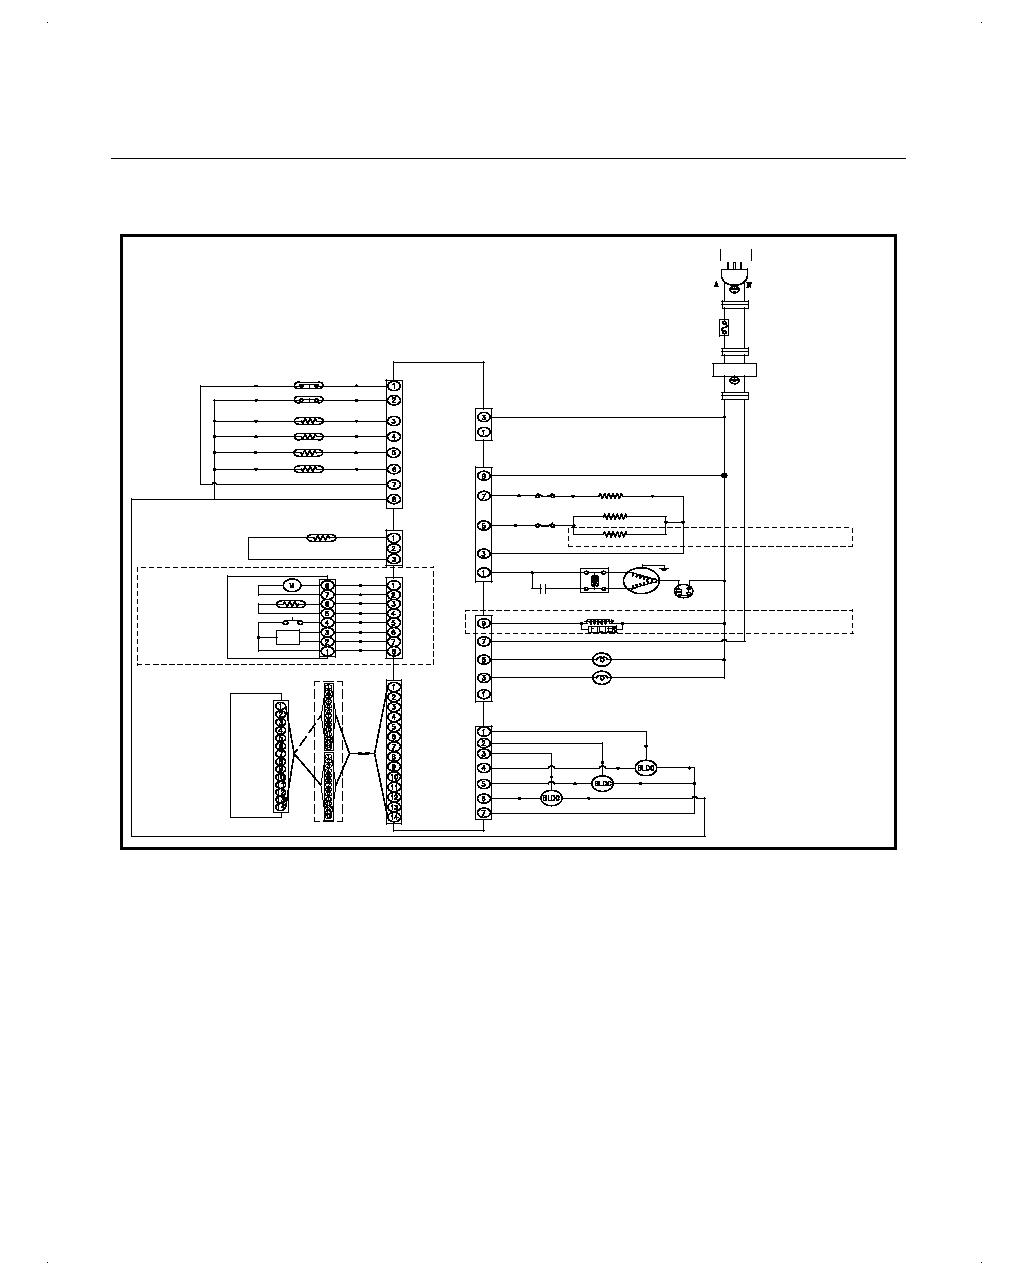 Samsung RB195ABBP/XAA User Manual (ver.0.2). Page 30, as